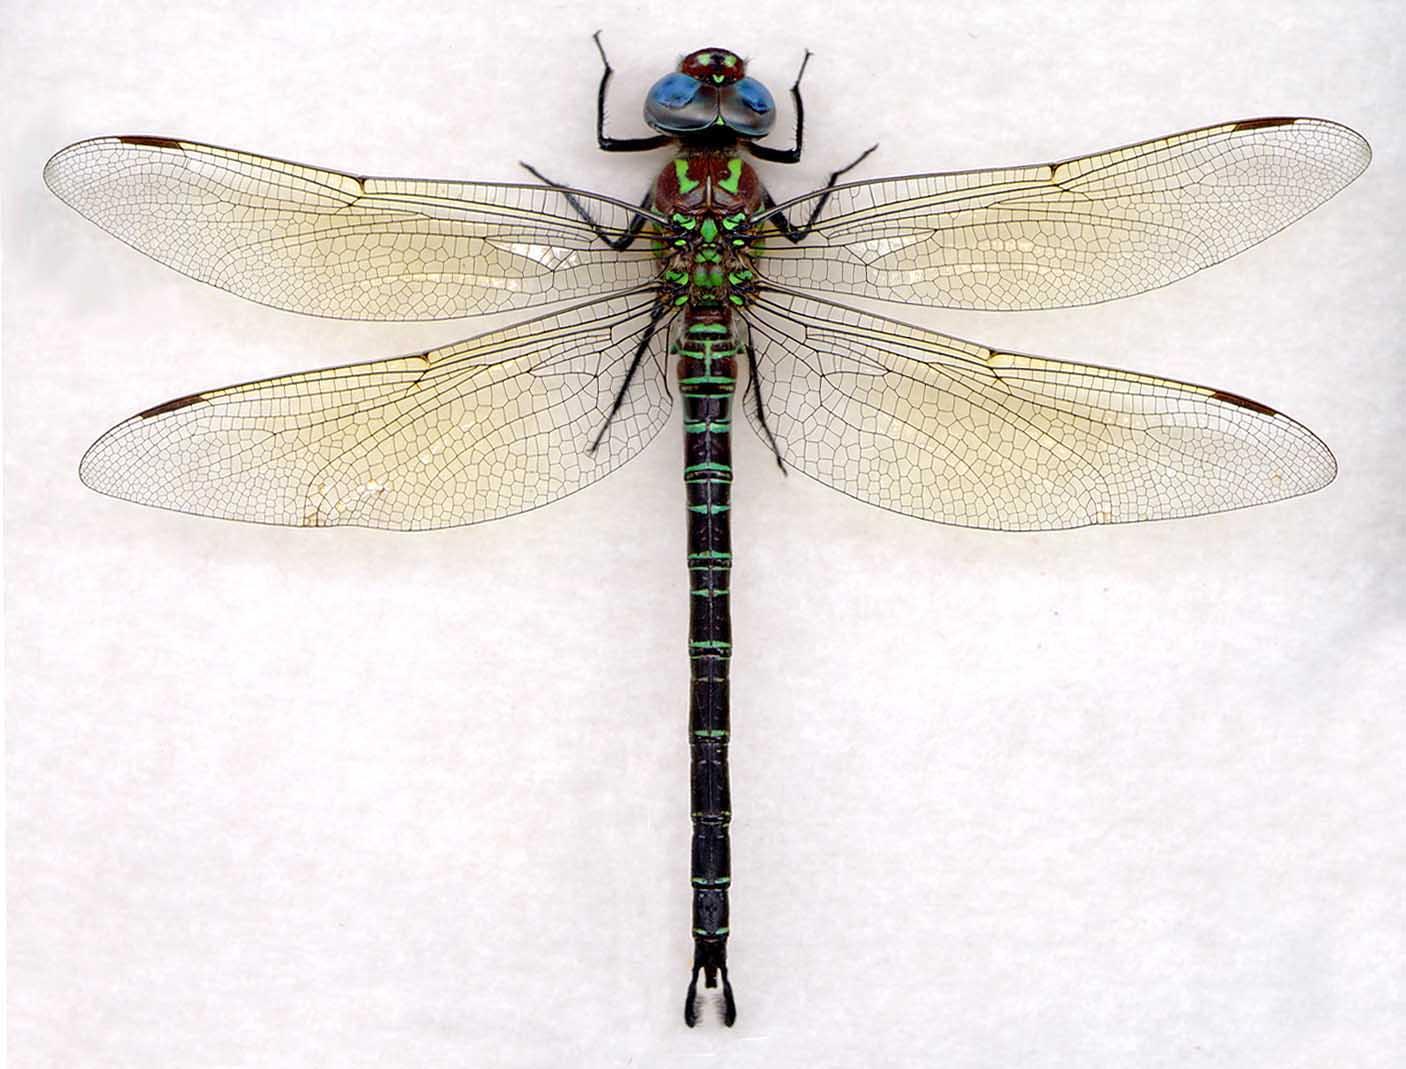 epiaeschna heros | The Dragonfly Woman